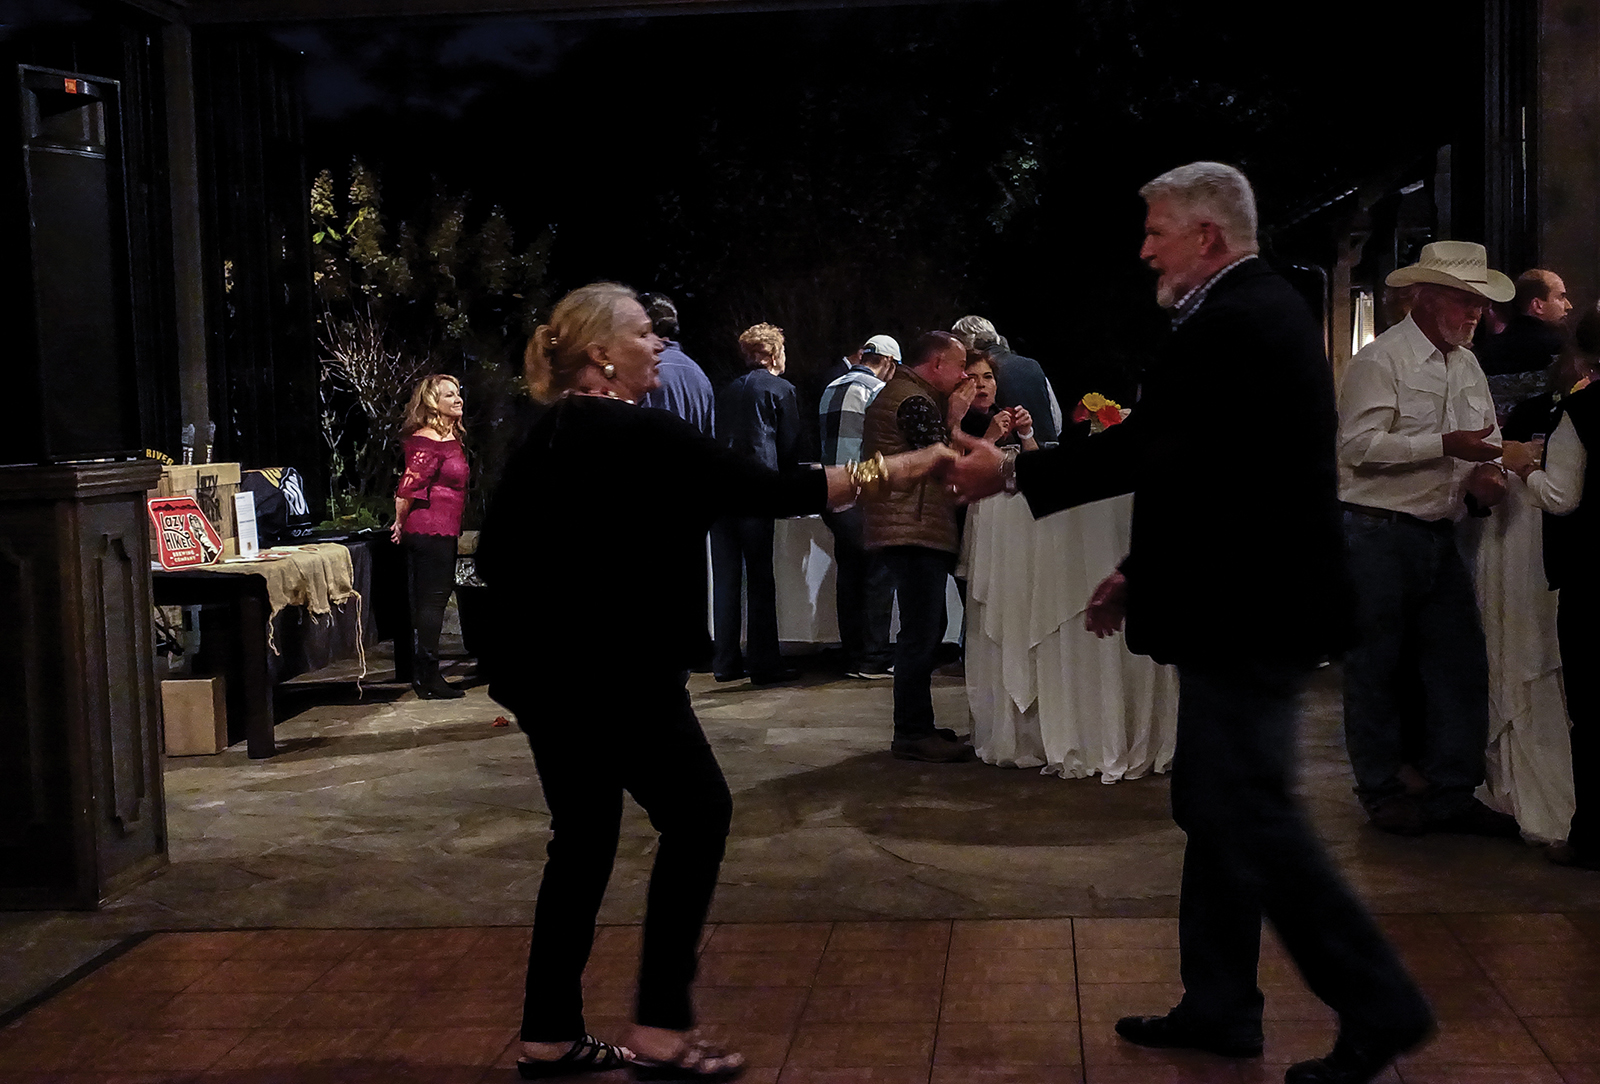 craft-beer-night-rotary-highlands-nc-dancing